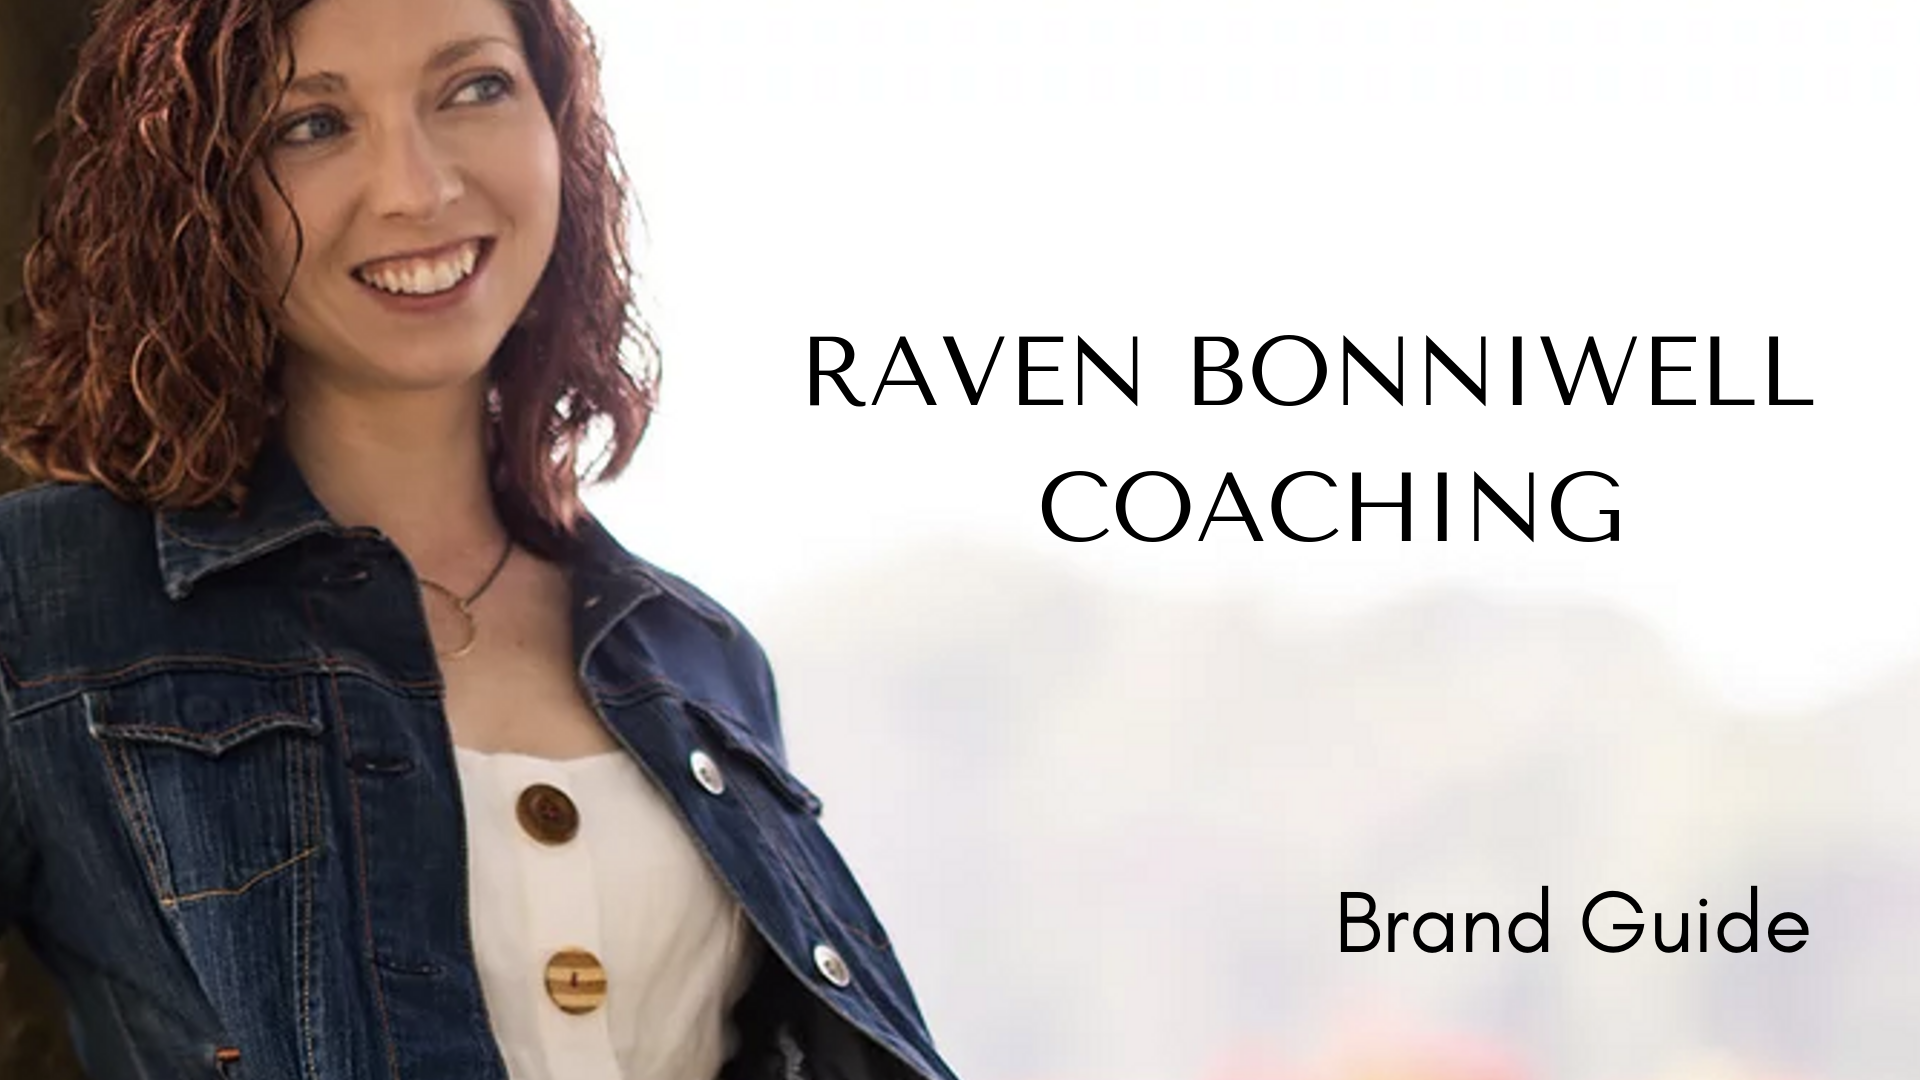 Raven Bonniwell Coaching_BRAND GUIDE (4).png